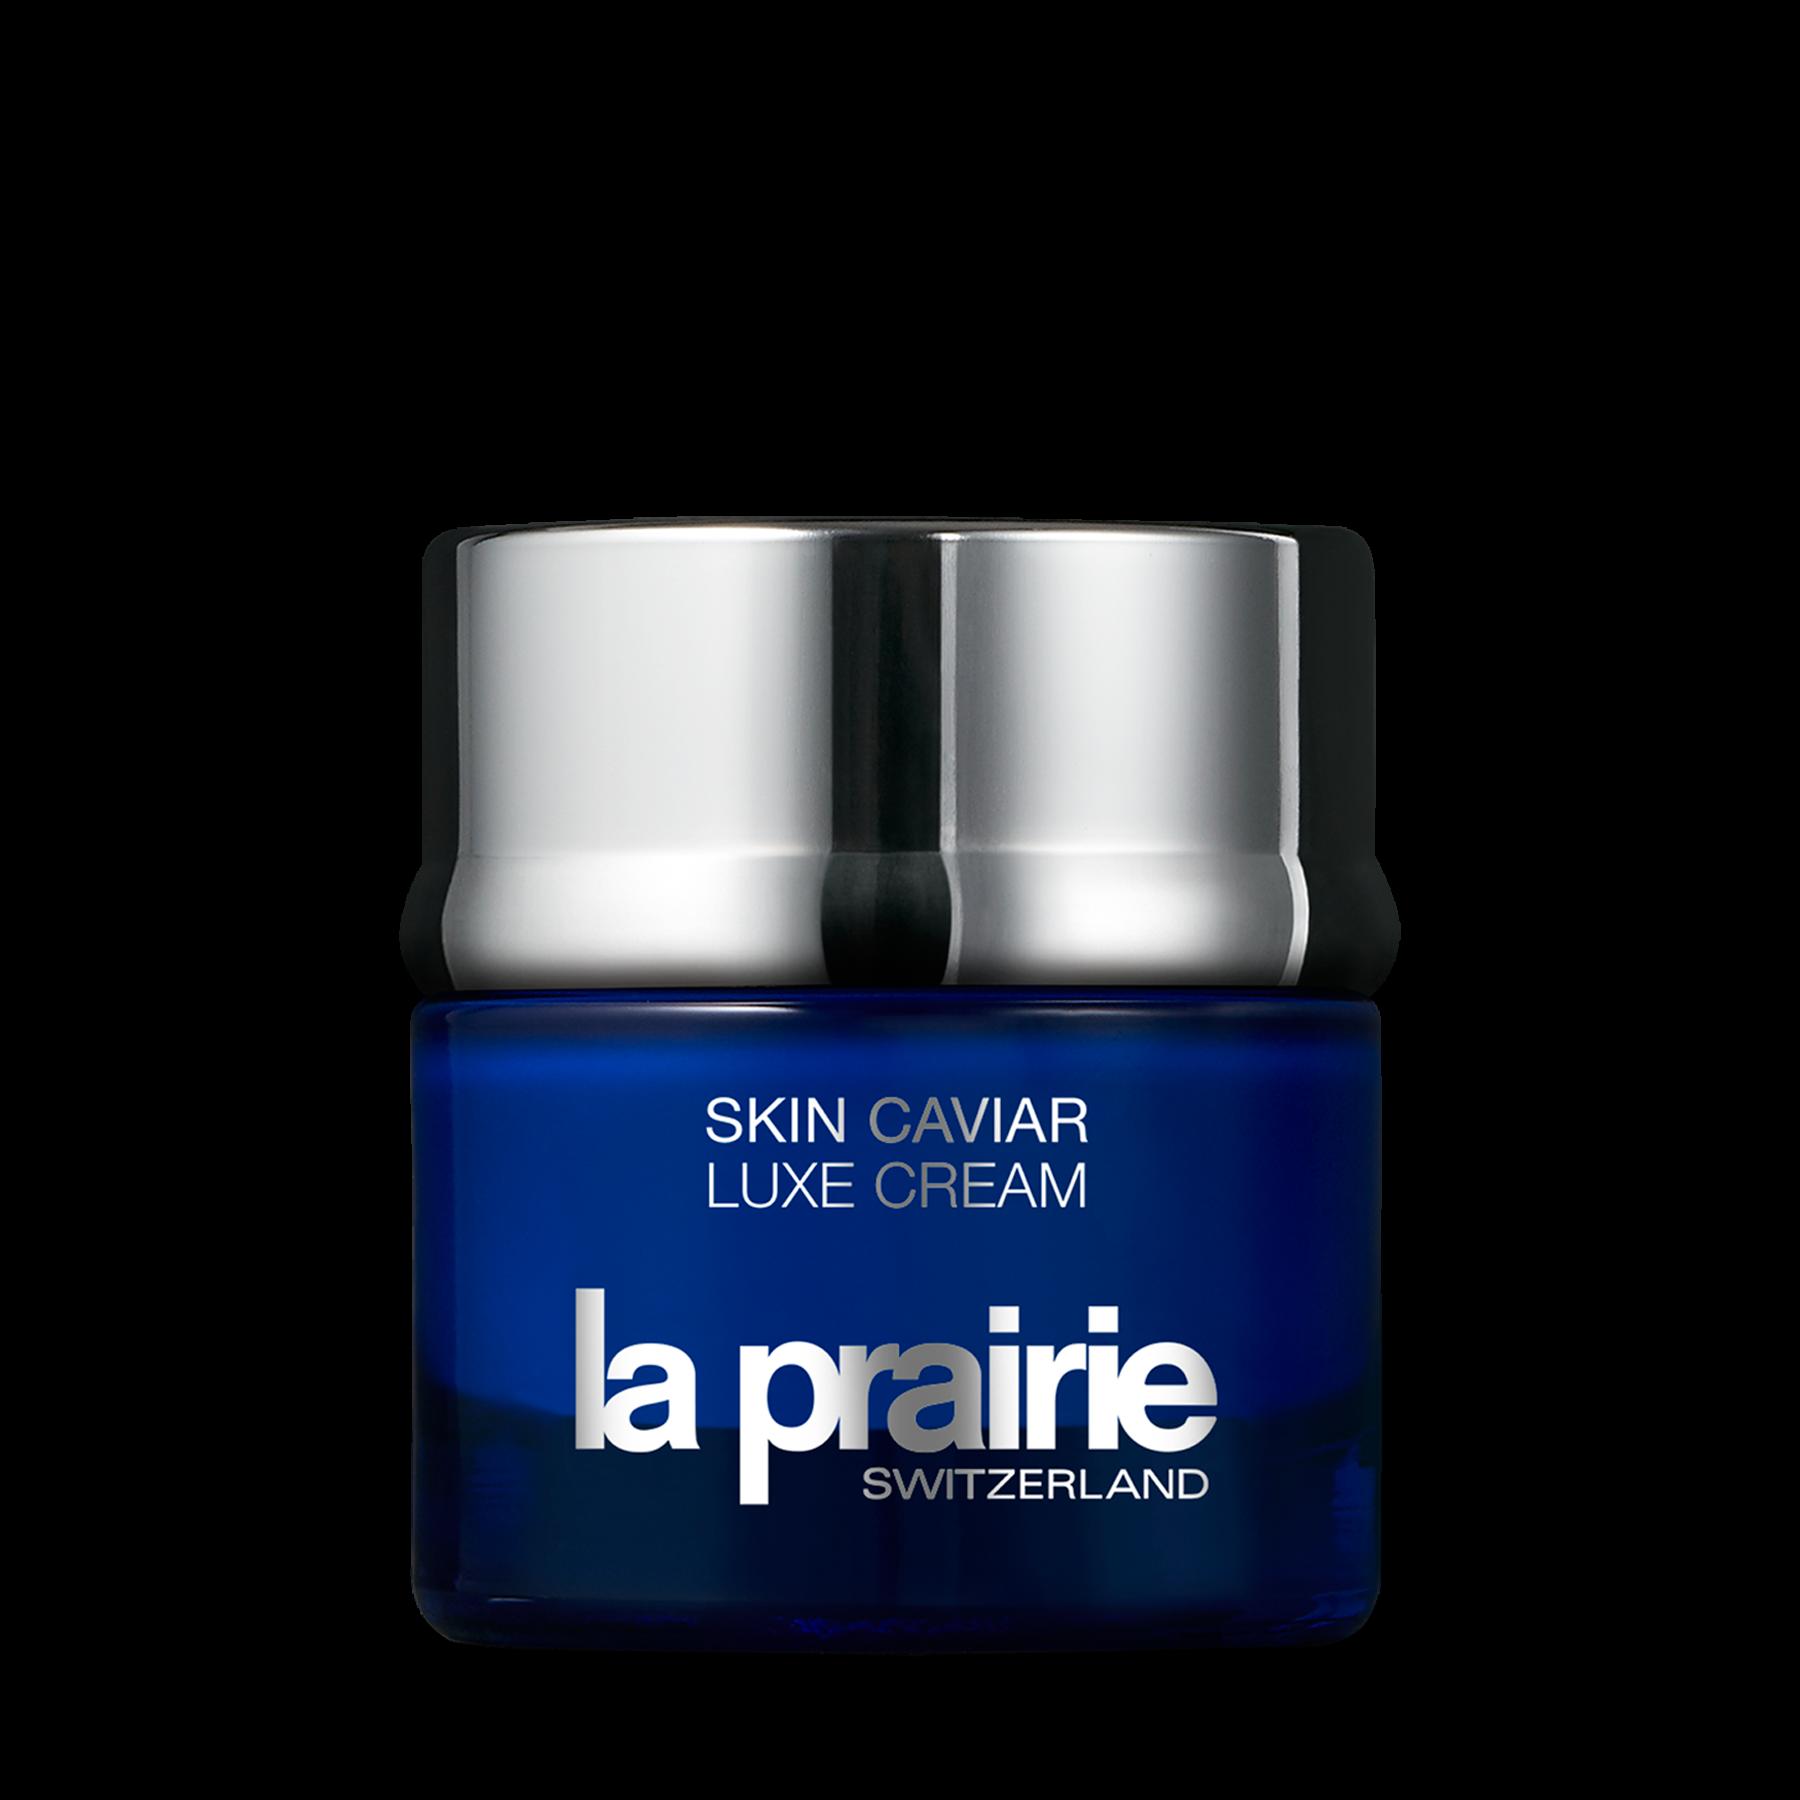 La Prairie Skin Caviar Luxe Cream (50 ml)